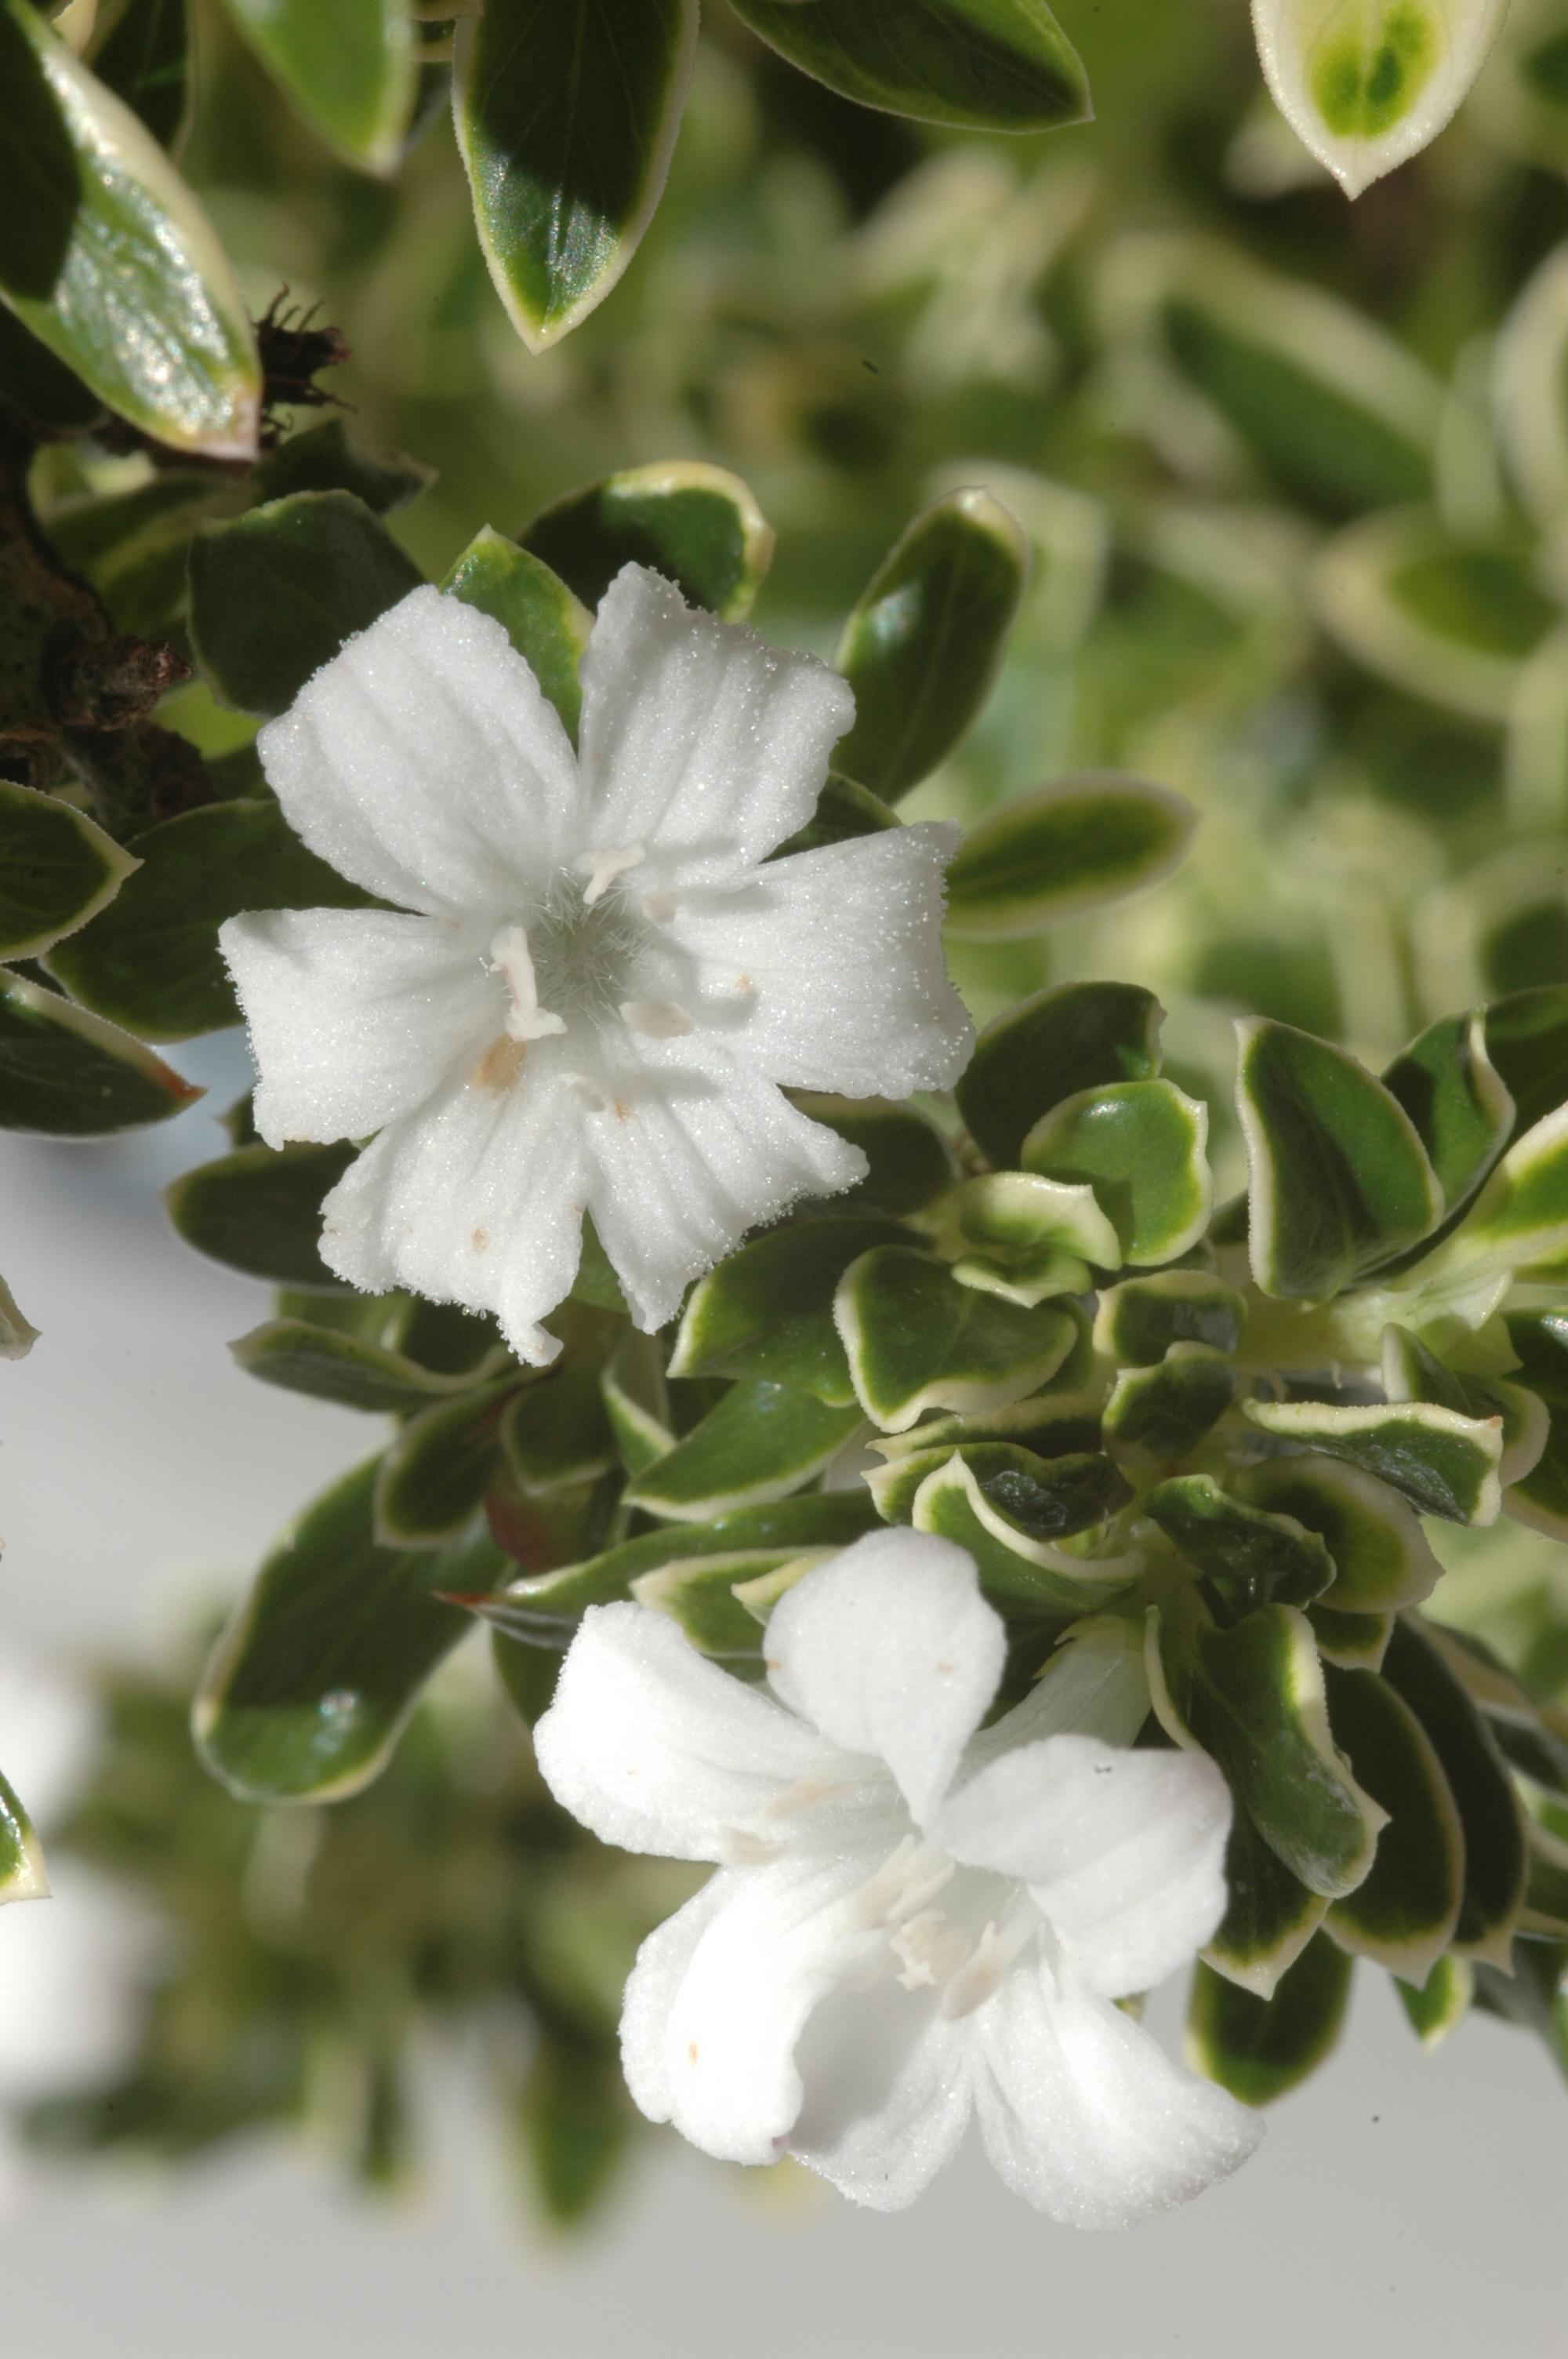 Now Ready For Sale Flowering Serissa Foetida Bonsai Bonsai Trees For Sale Uk